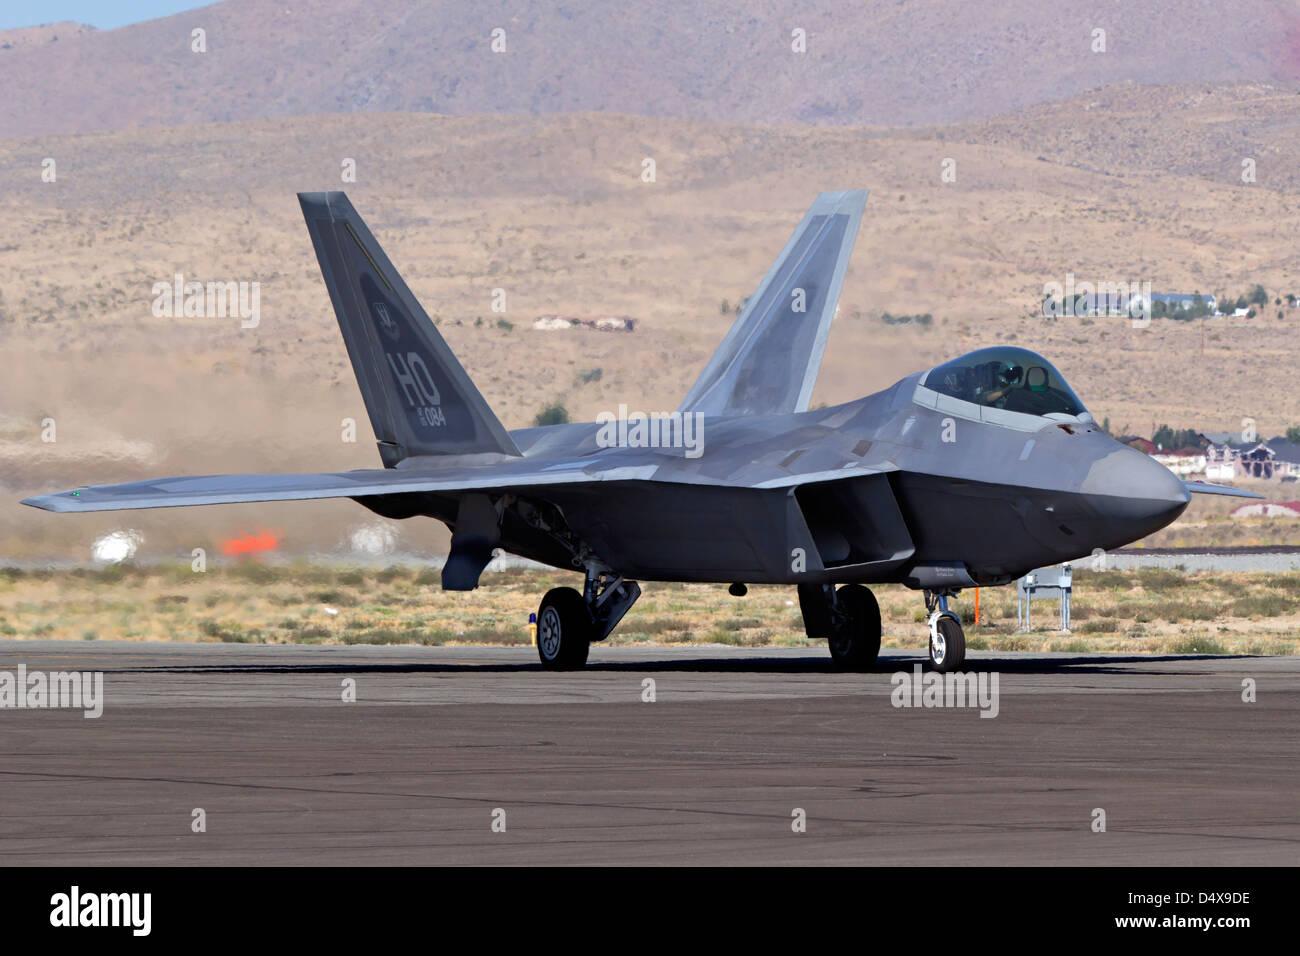 F-22 Raptor taxiing. - Stock Image